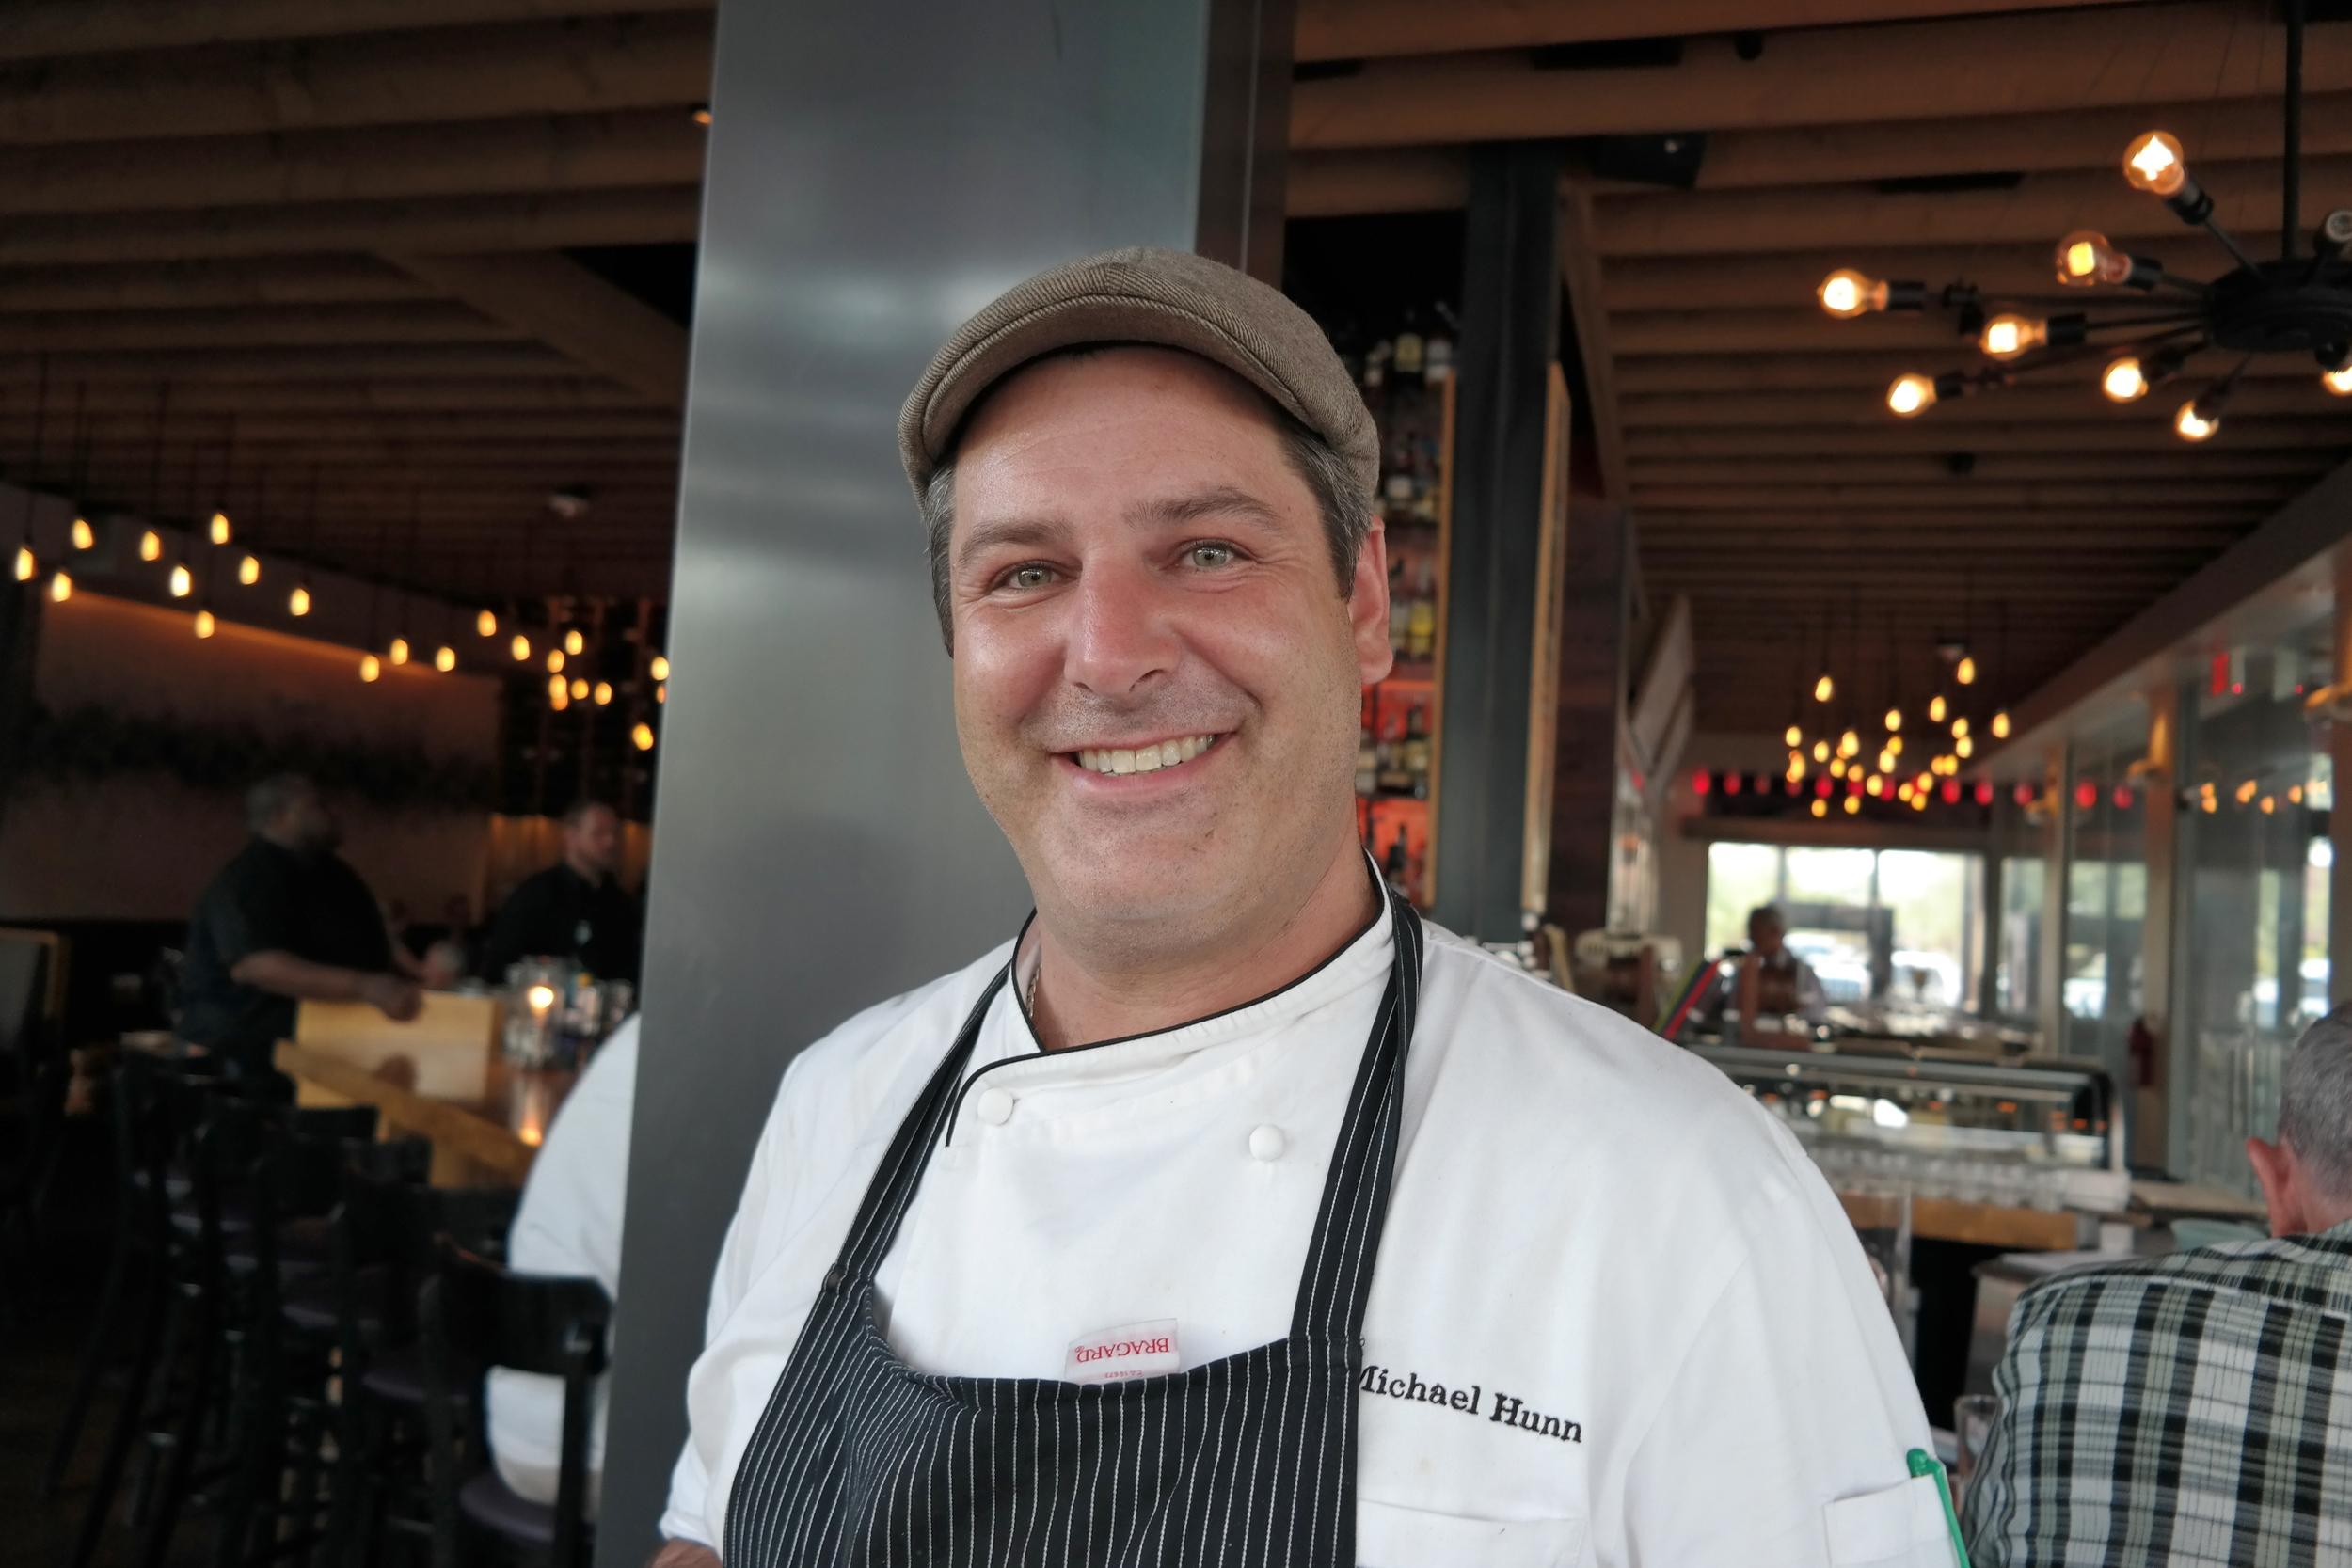 Chef Michael Hunn